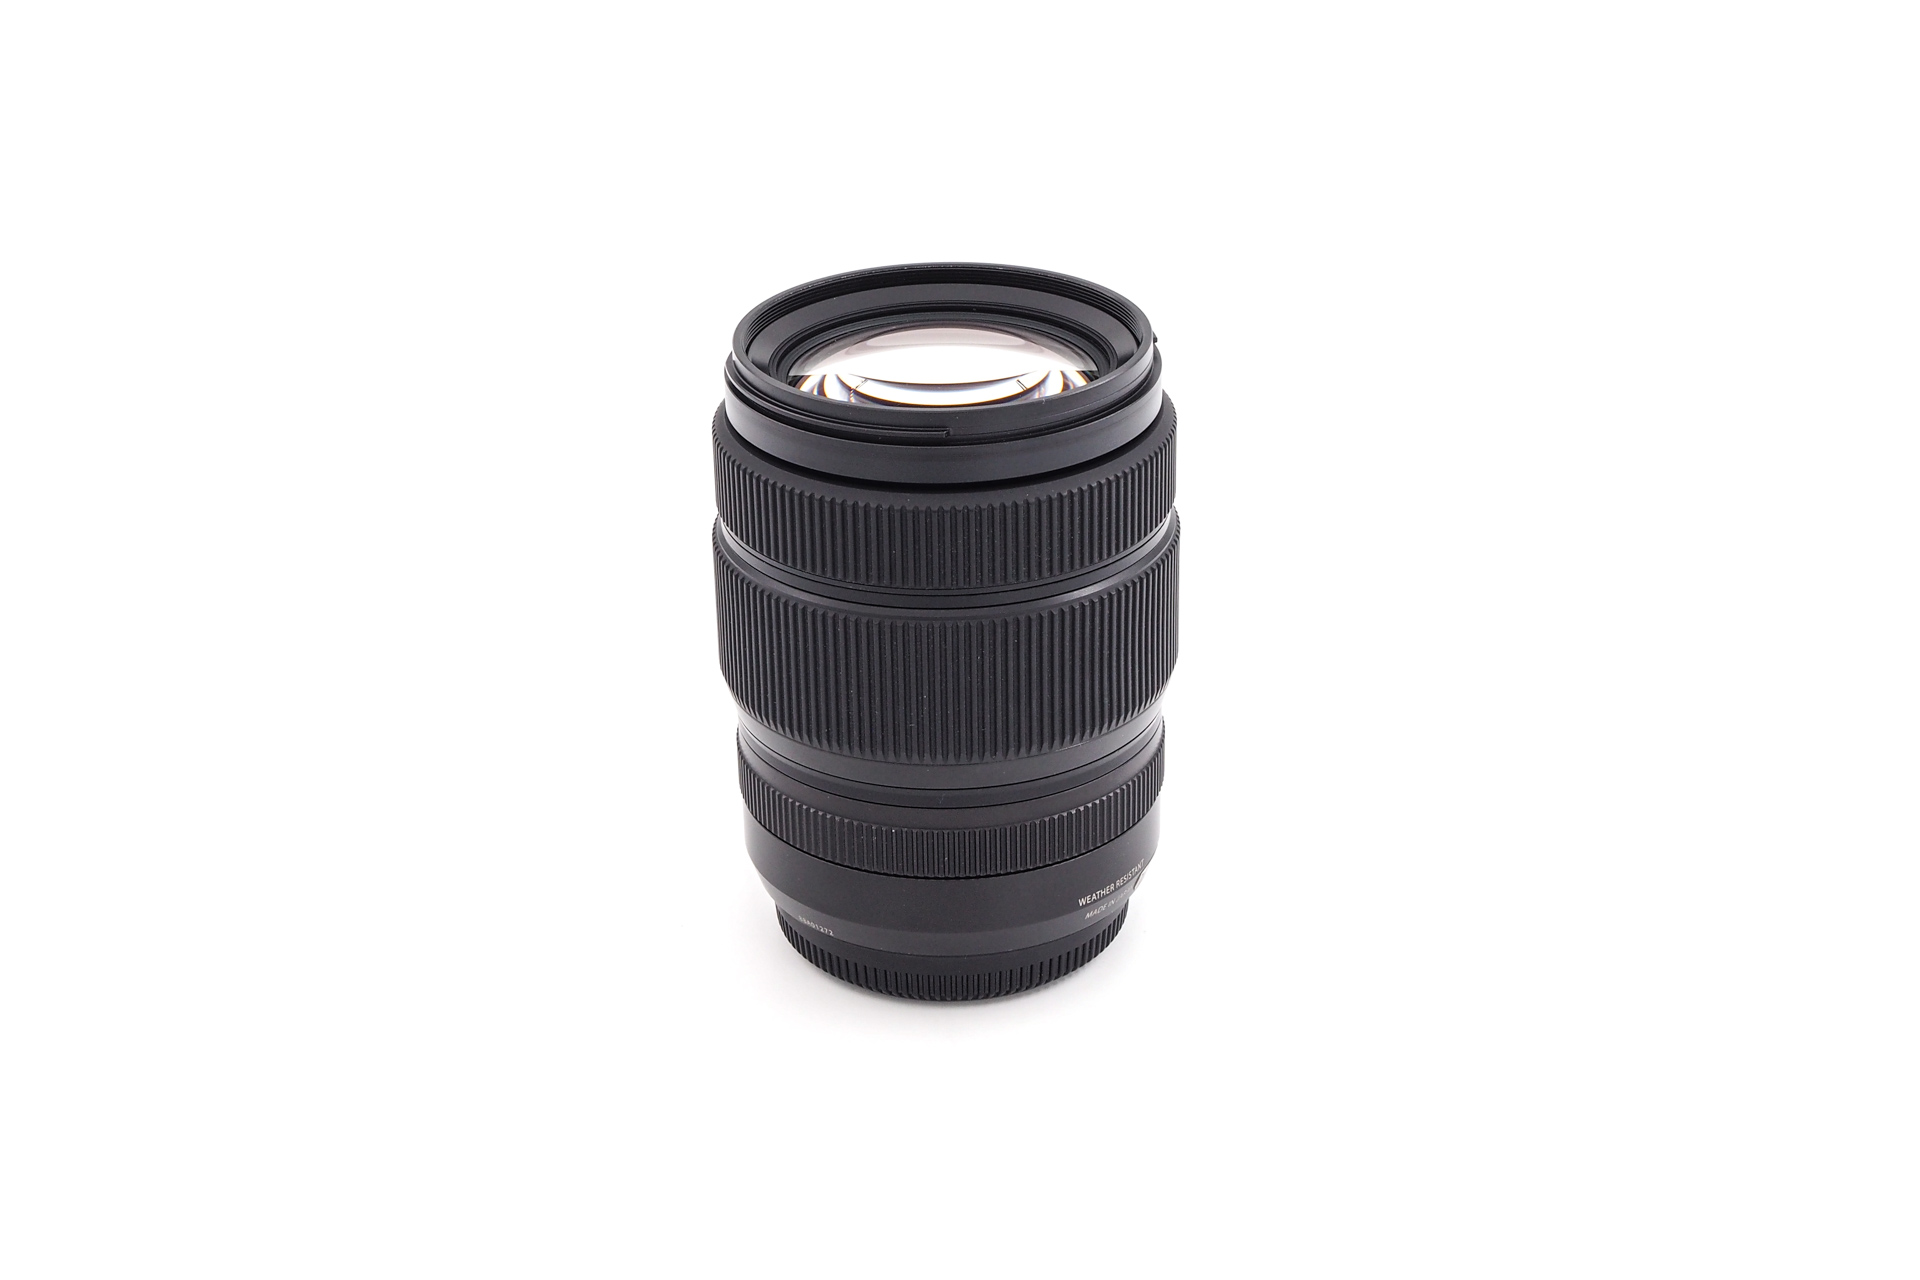 Fujifilm GF 32-64mm F/4